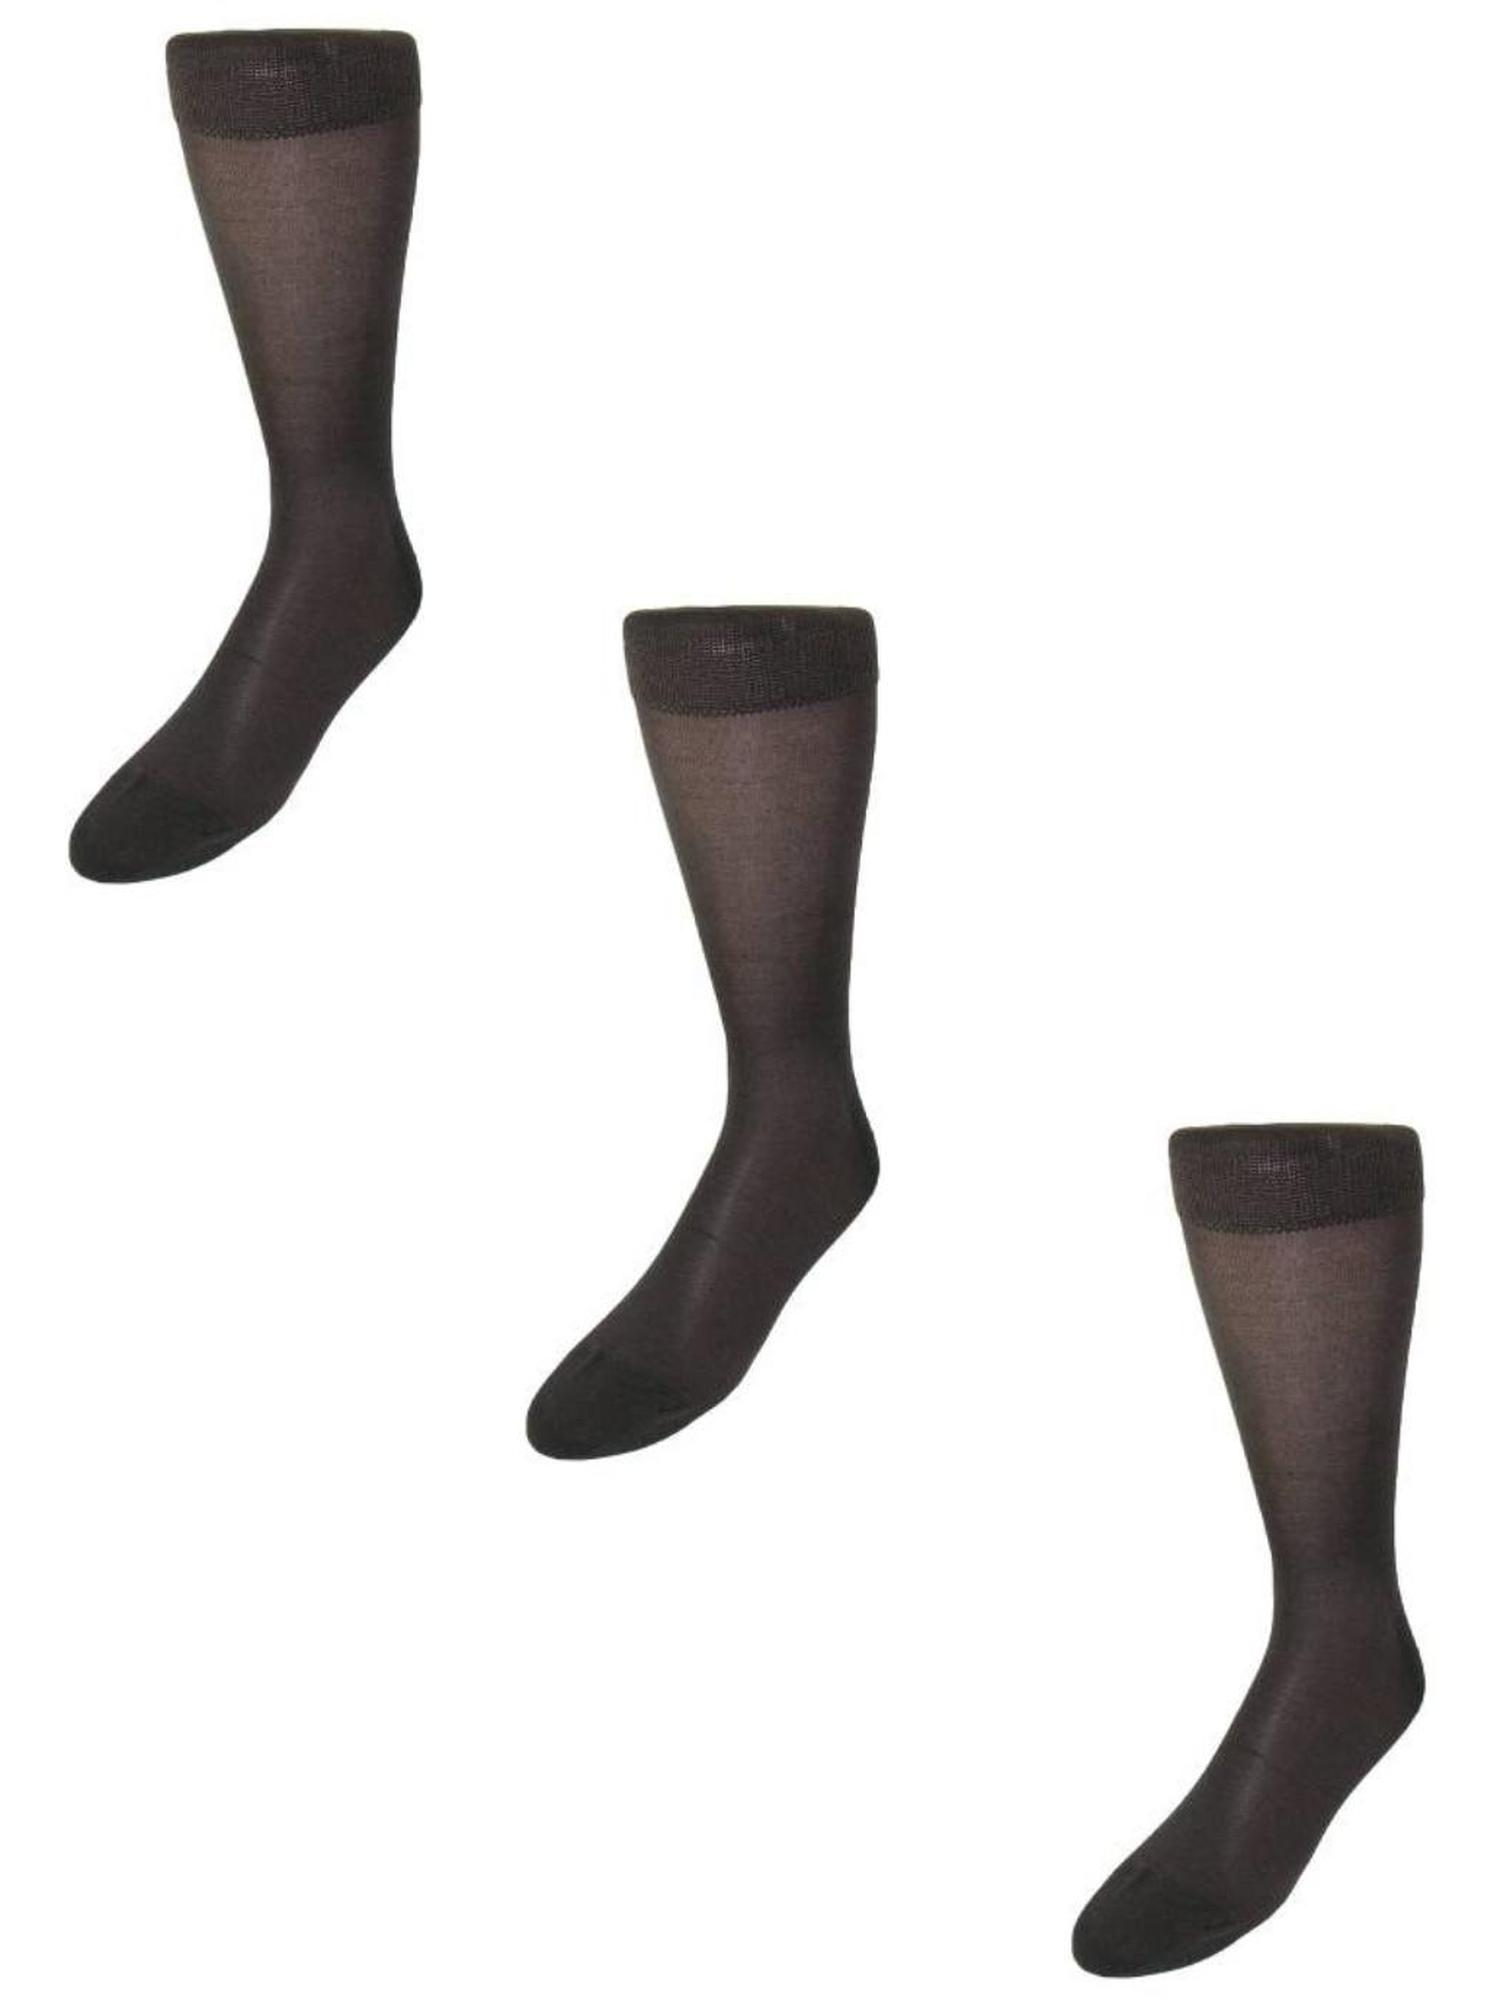 Size one size Men's Silk Mid Calf Dress Socks (Pack of 3)